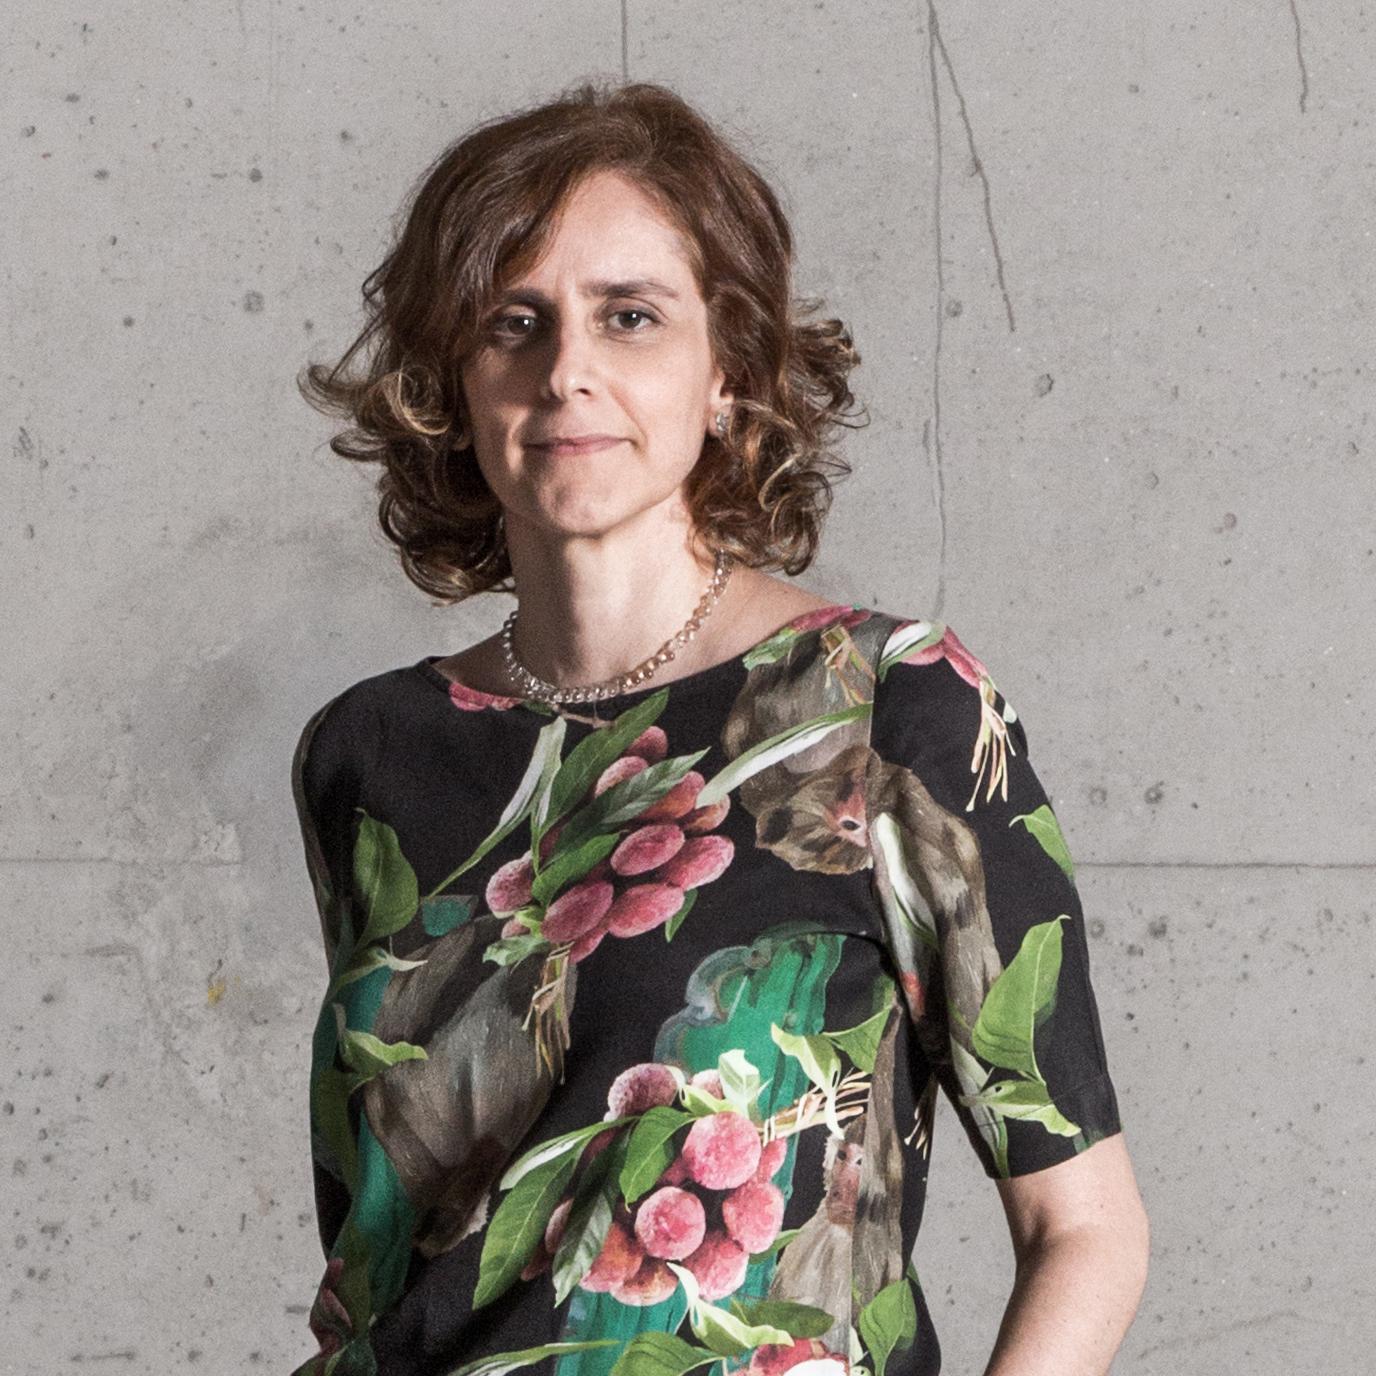 Mariana Travassos - Designer de Interiores. Designer de Produto. Coordenadora de projetos.